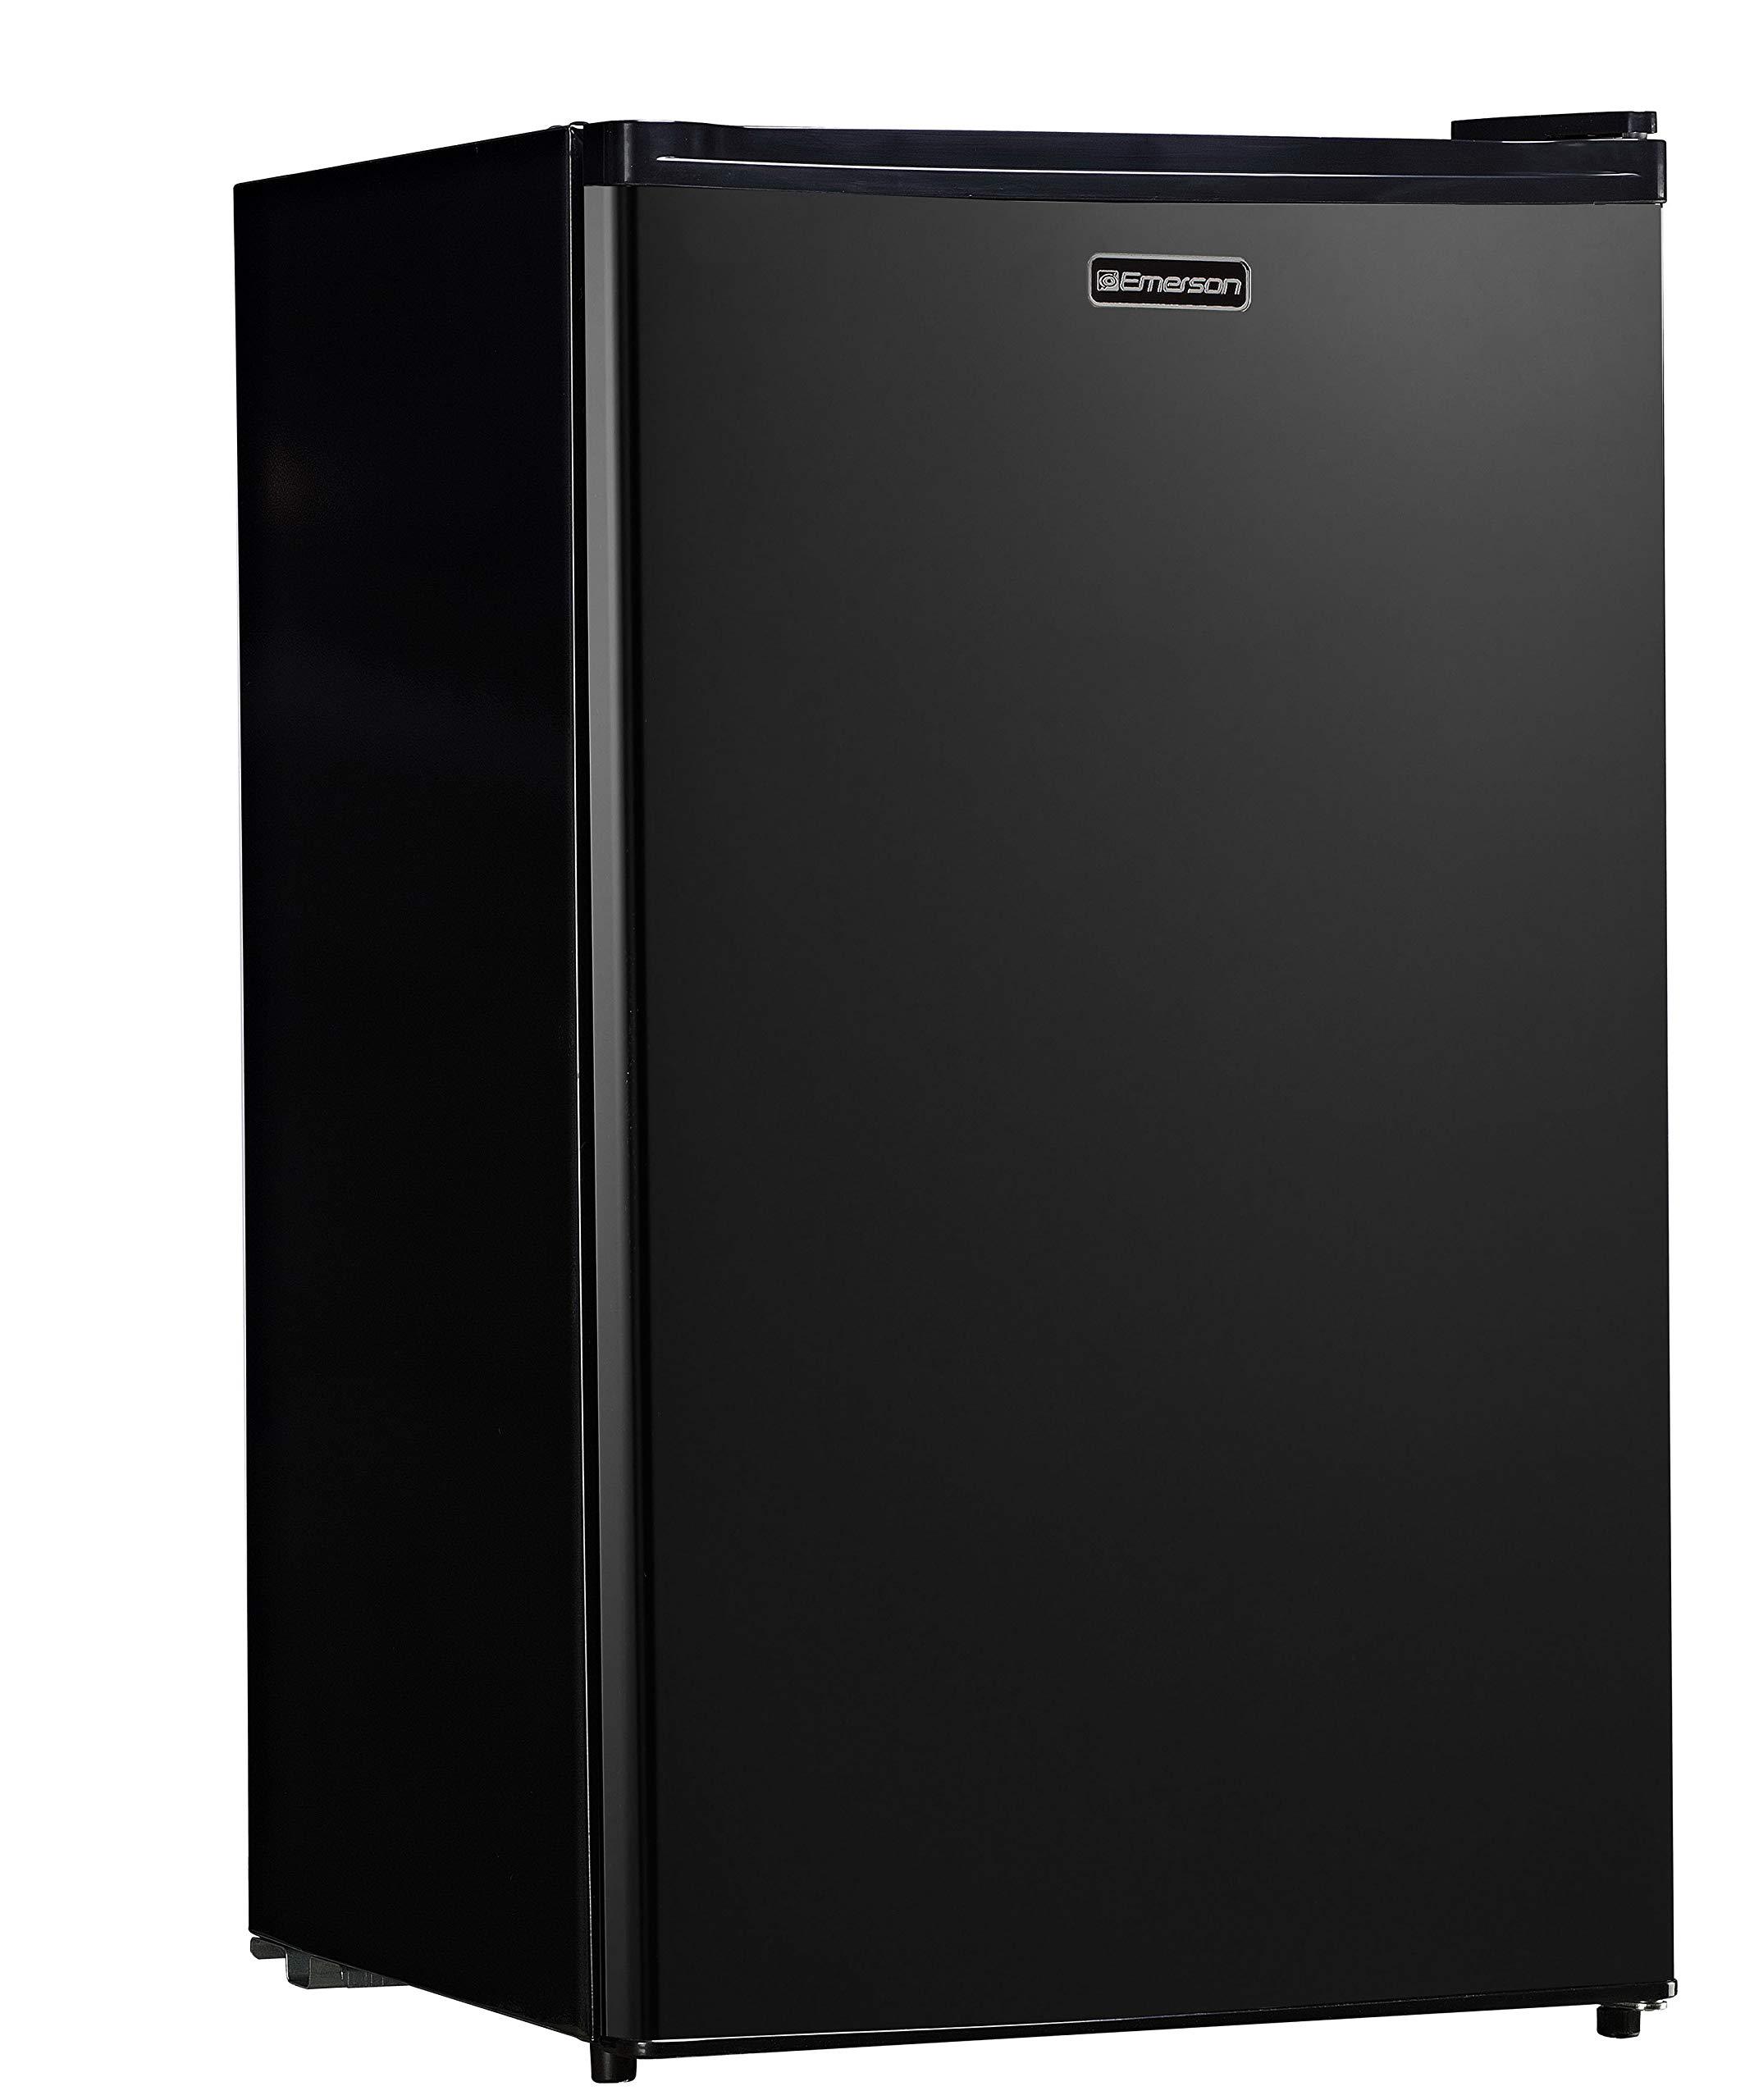 Emerson CR440BE 4.4 Cubic Foot Compact Single Door Refrigerator cu. ft, Black